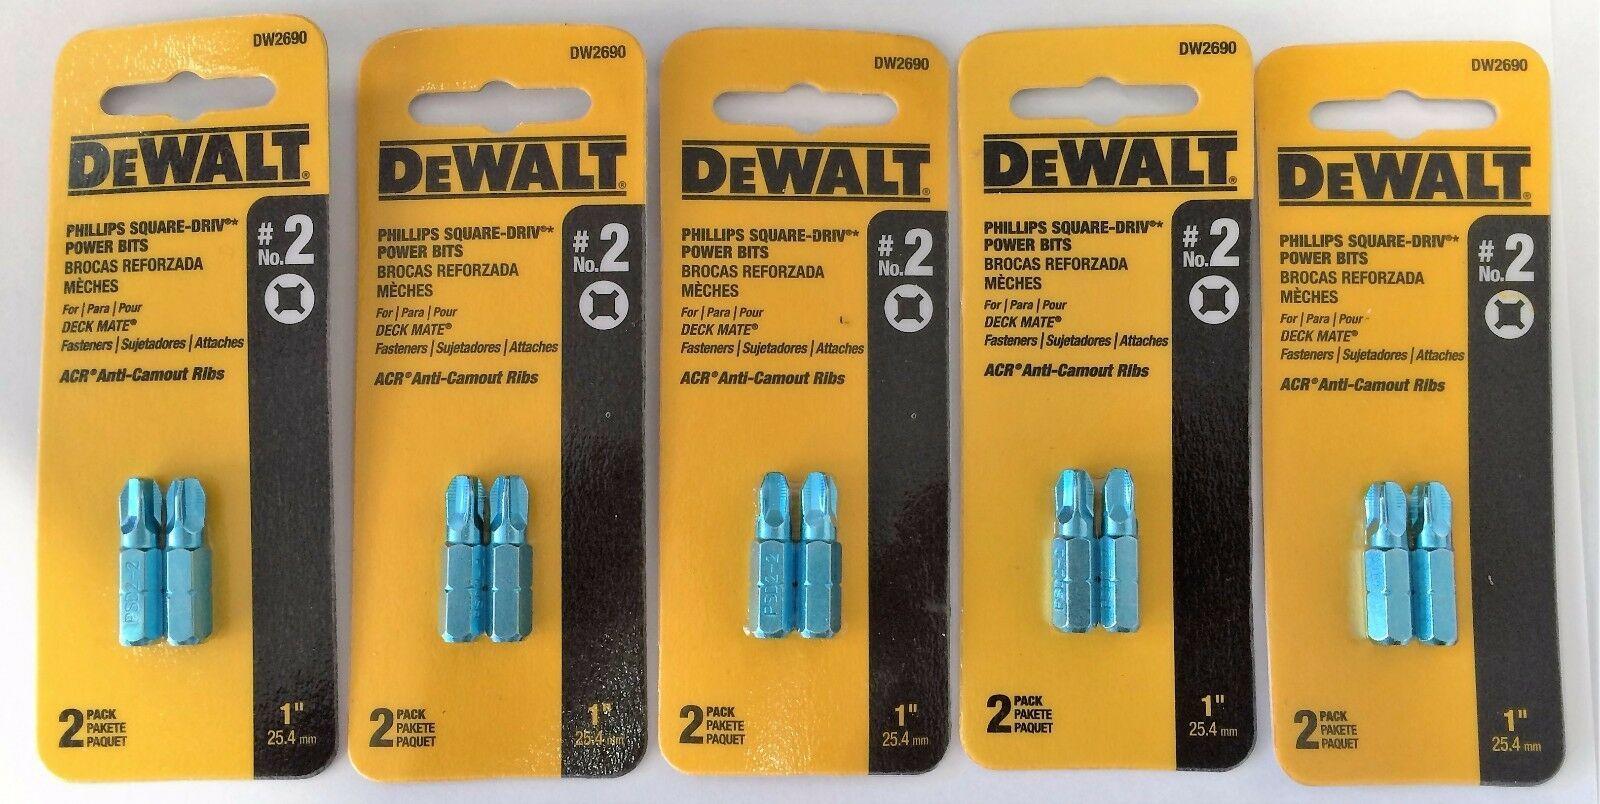 Dewalt DW2690 #2 Phillips Square Drive Power Screw Tips 5 (2PKS) - $5.94